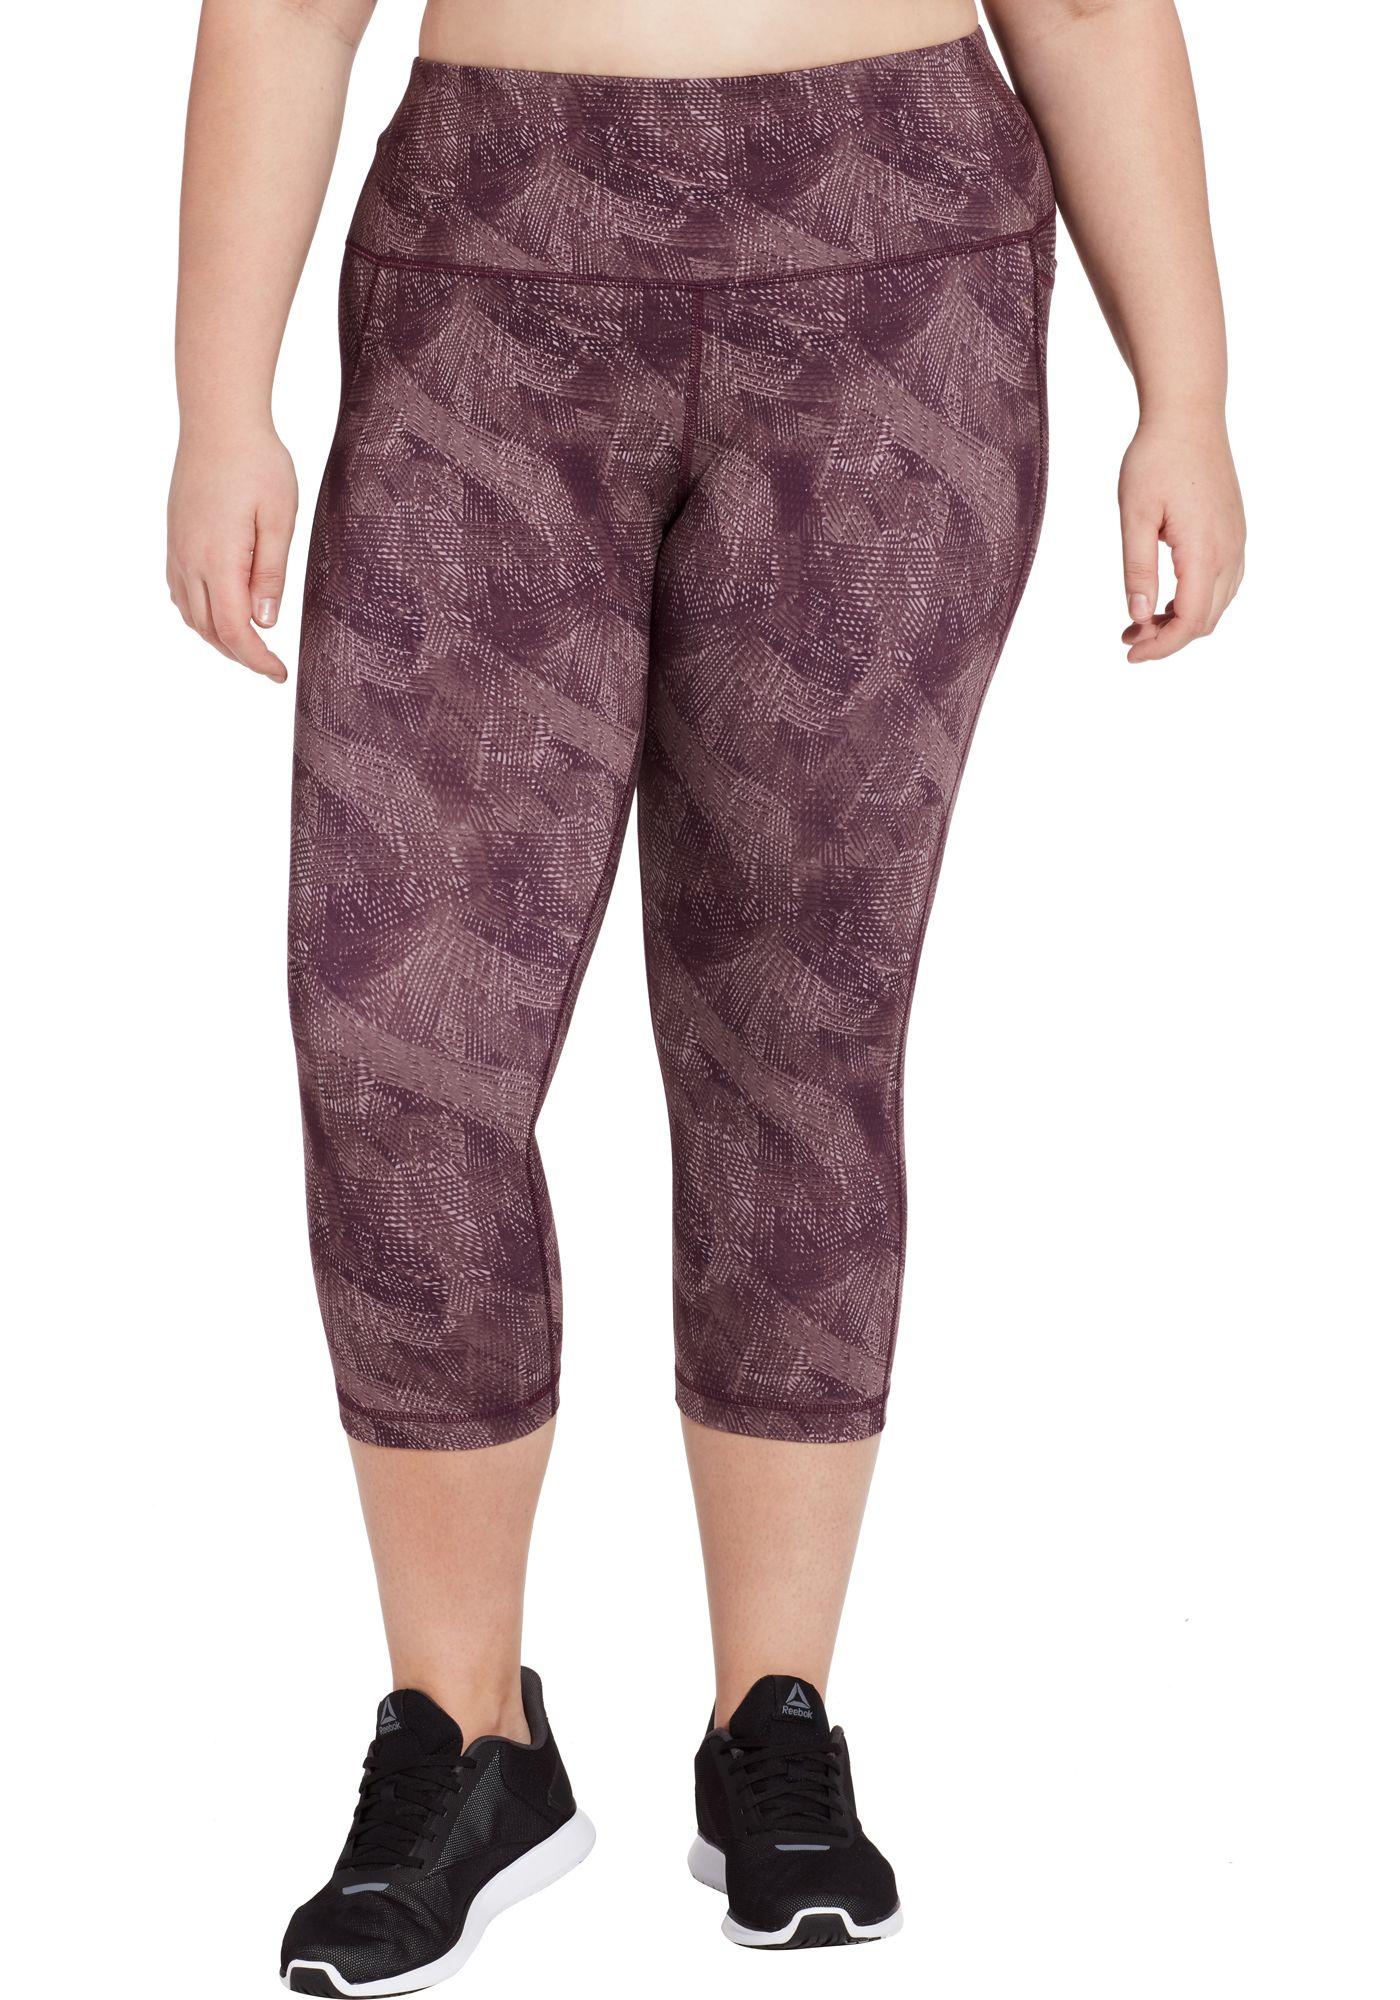 Reebok Women's Plus Size Printed Performance Pocket Capris